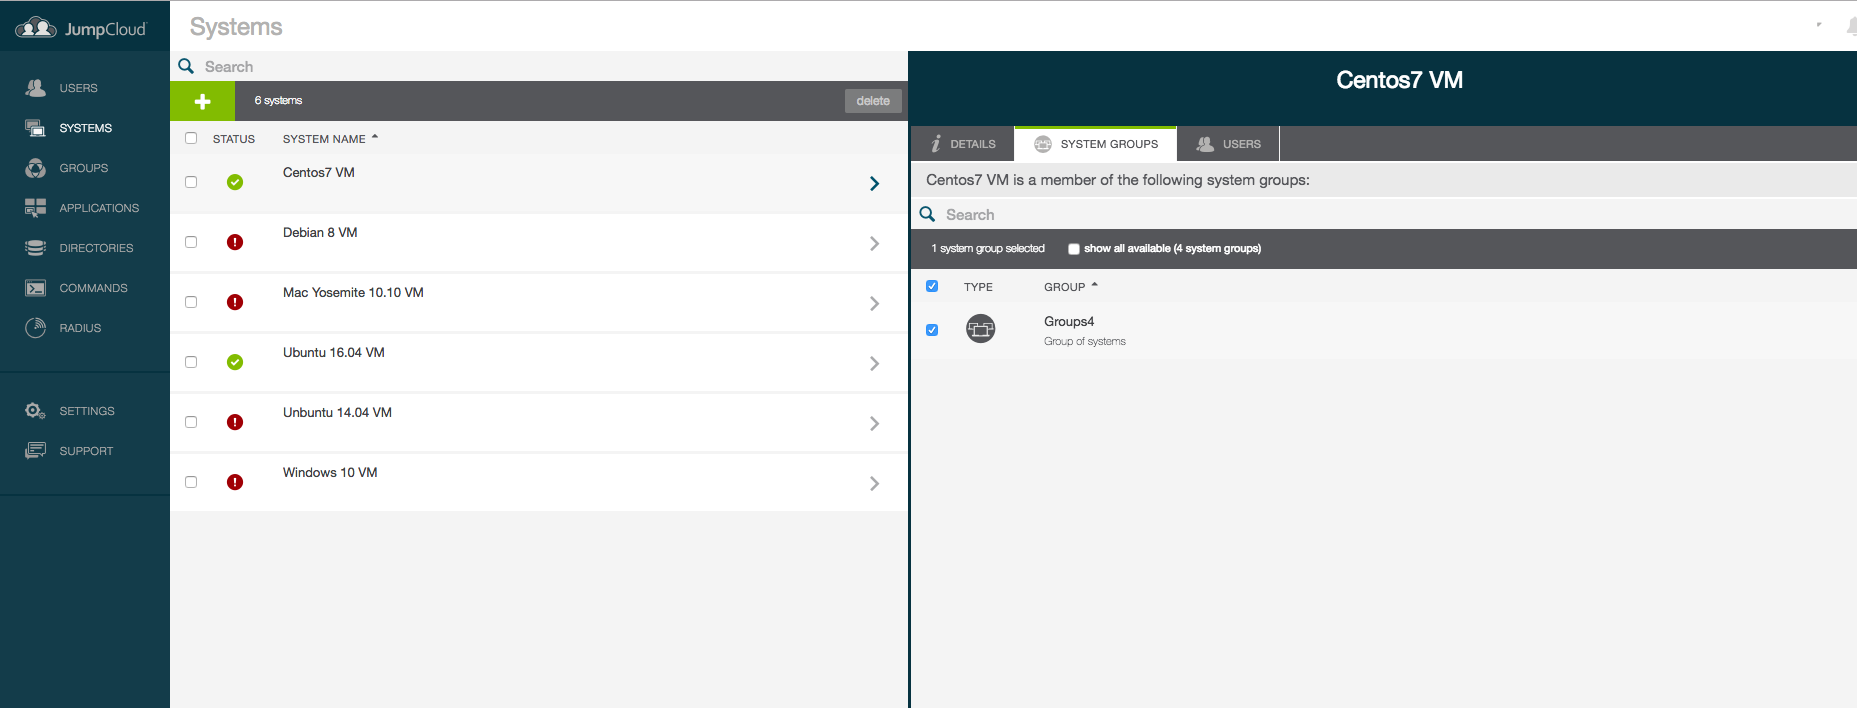 JumpCloud Directory-as-a-Service Demo - JumpCloud - Screenshot 2